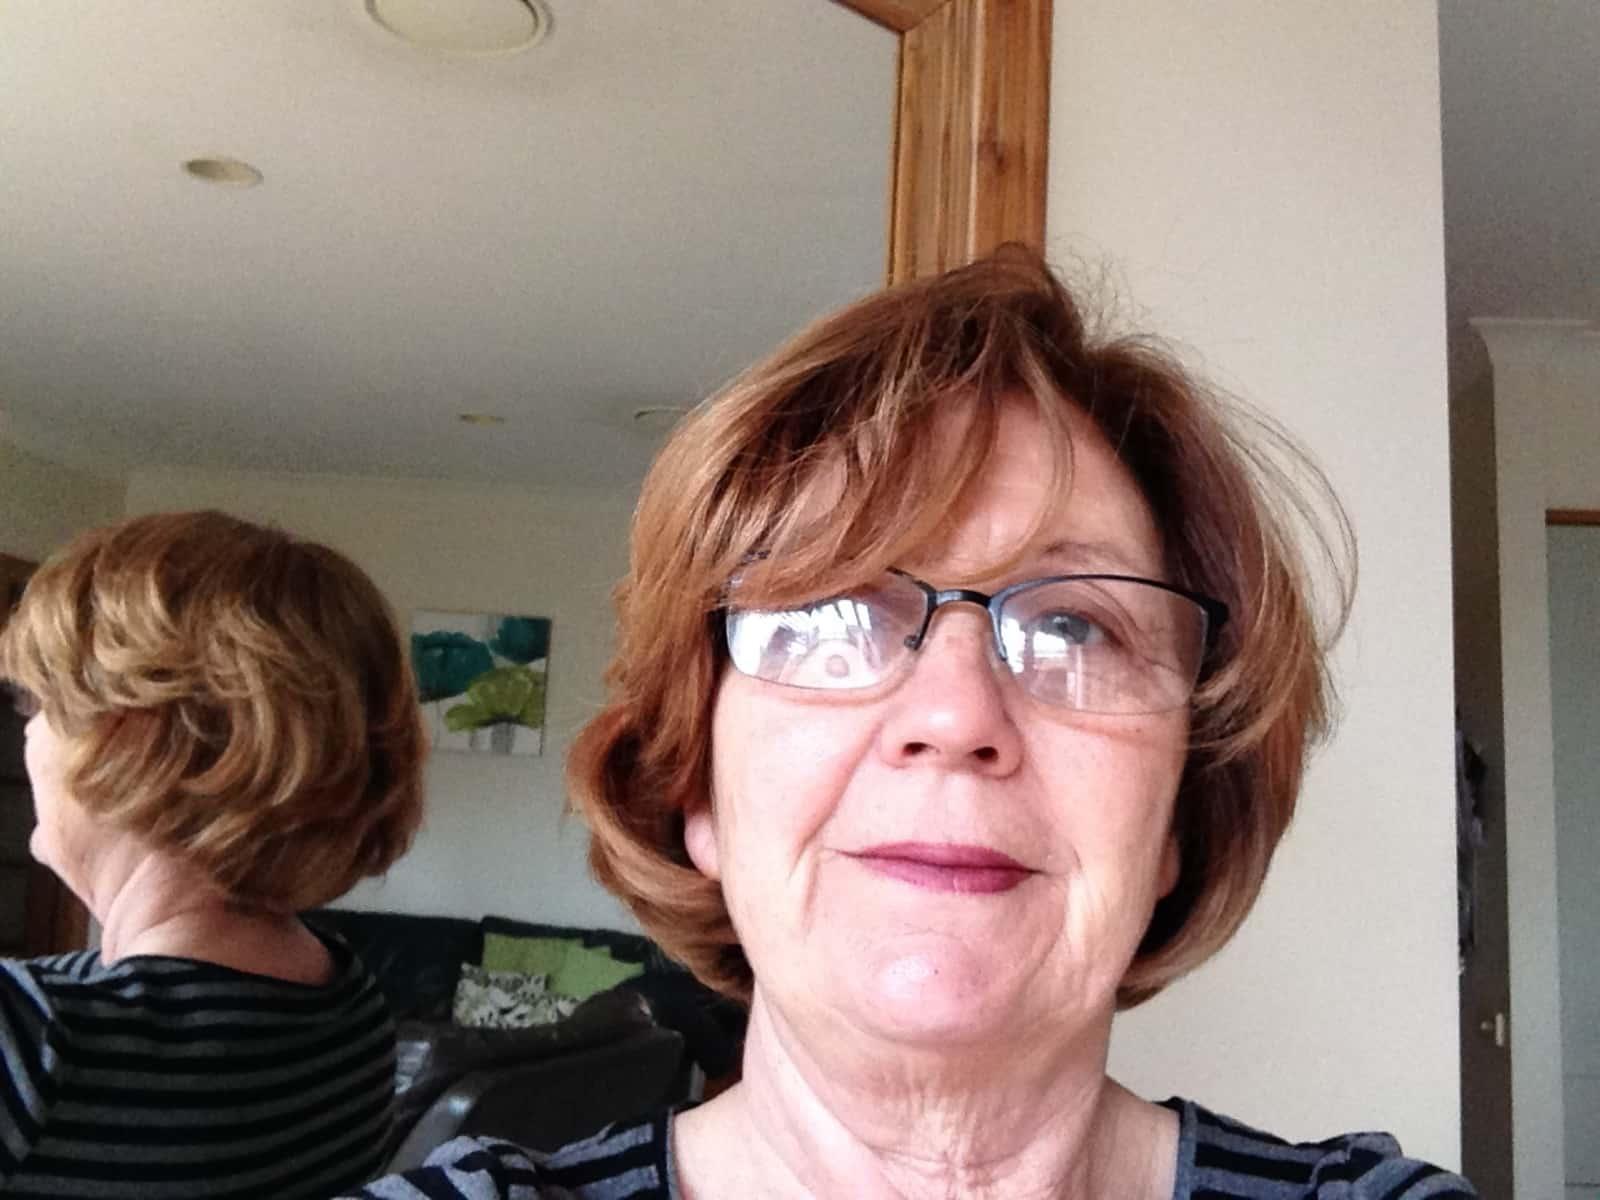 Susan from Lara, Victoria, Australia